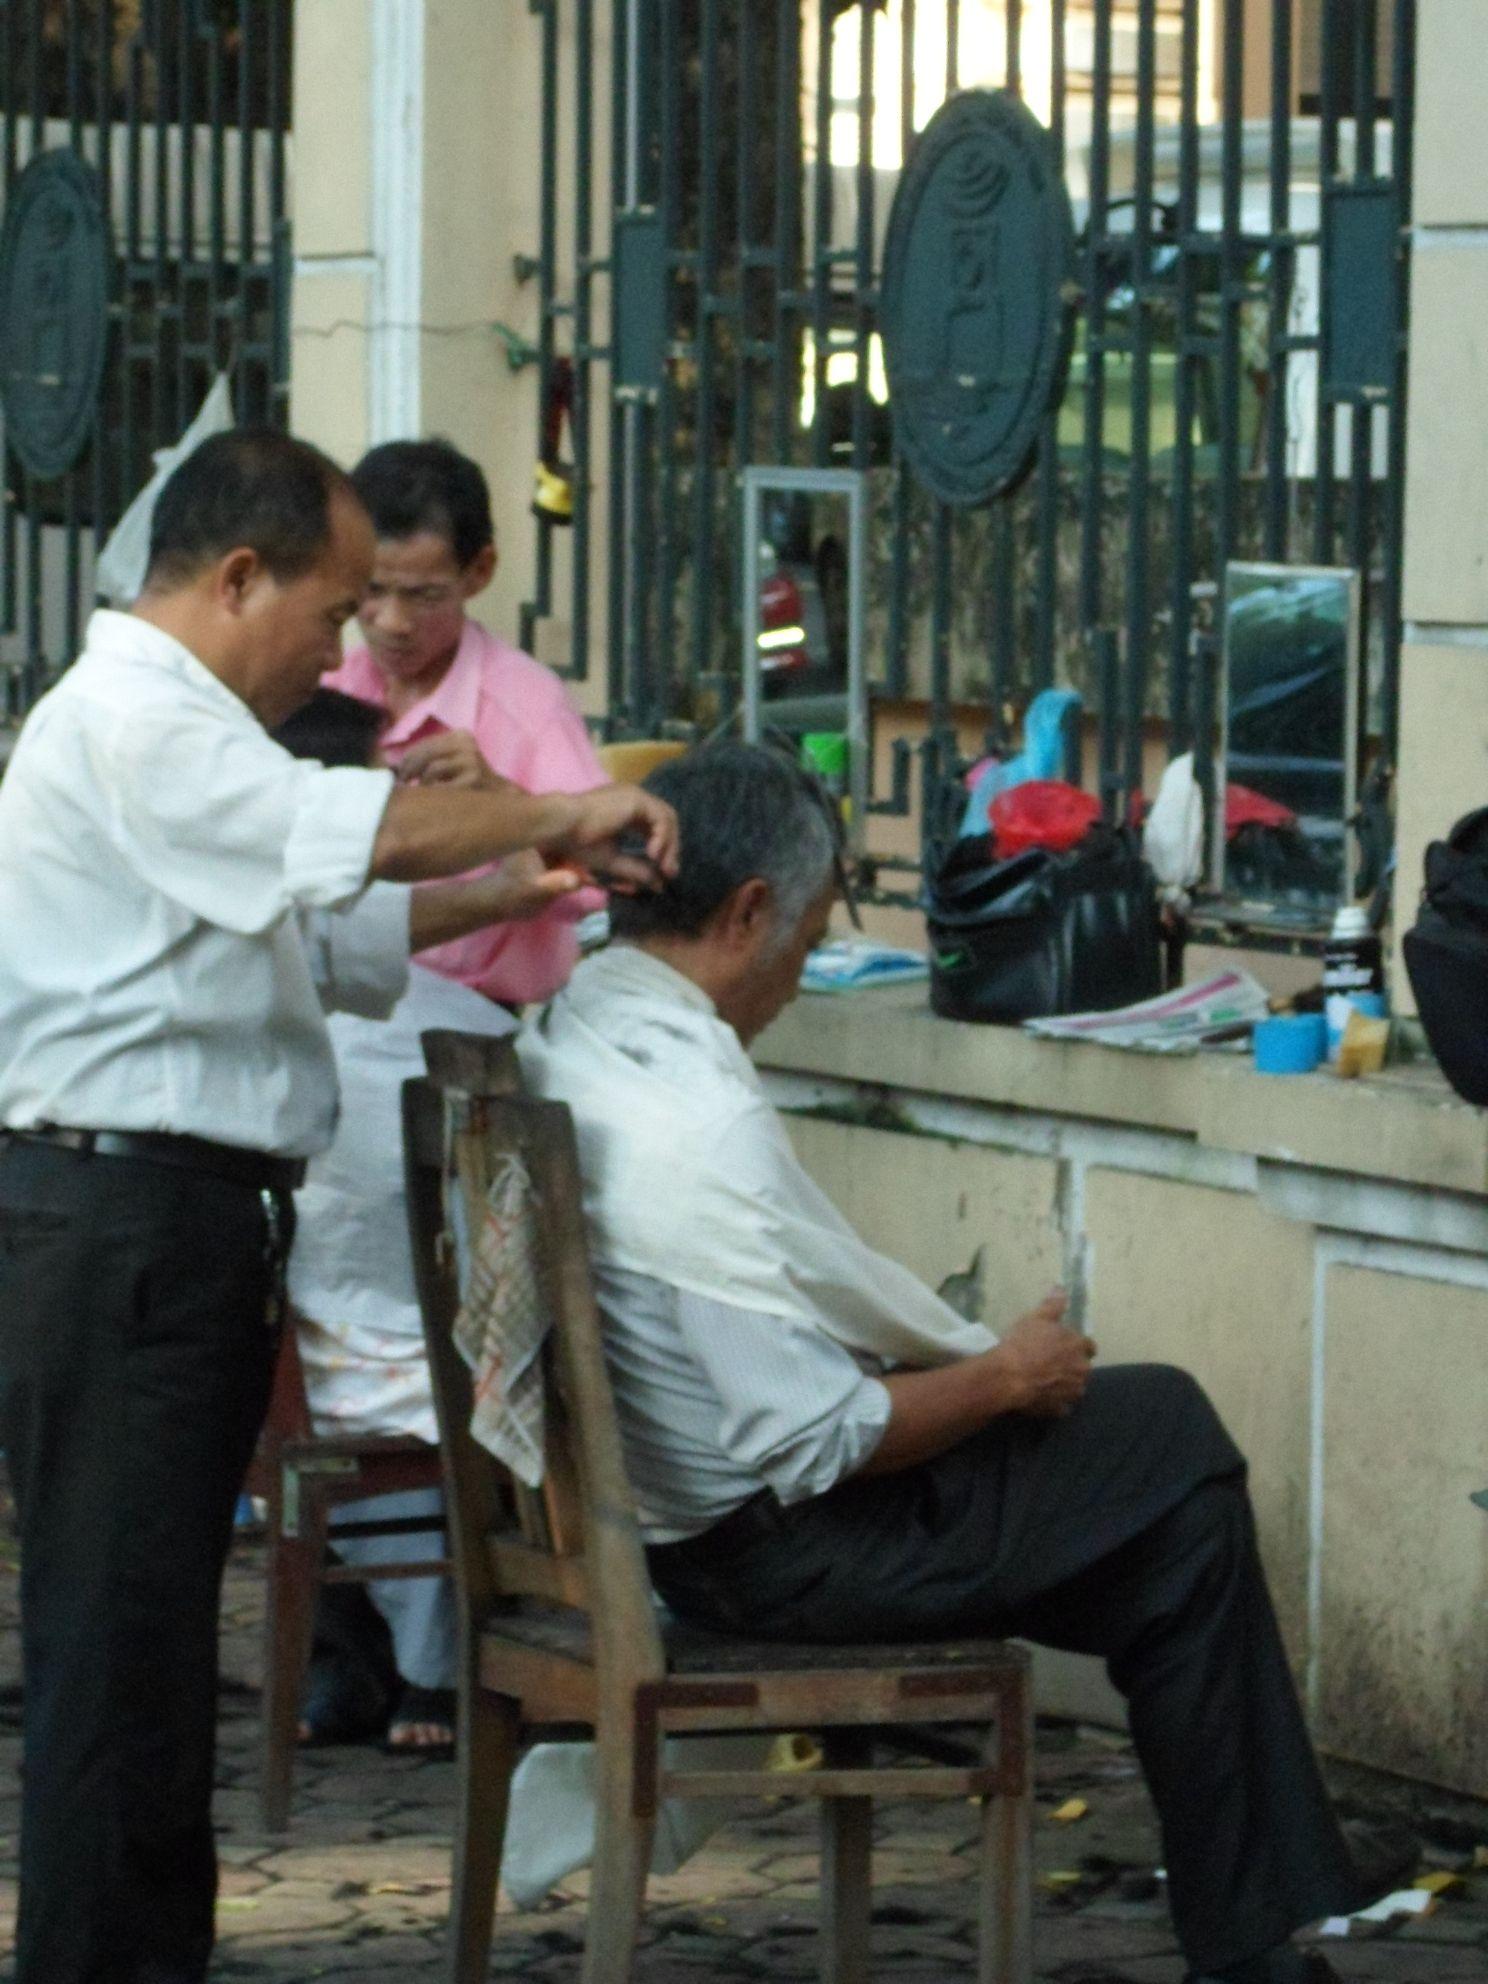 12+ Salon de coiffure vernon des idees